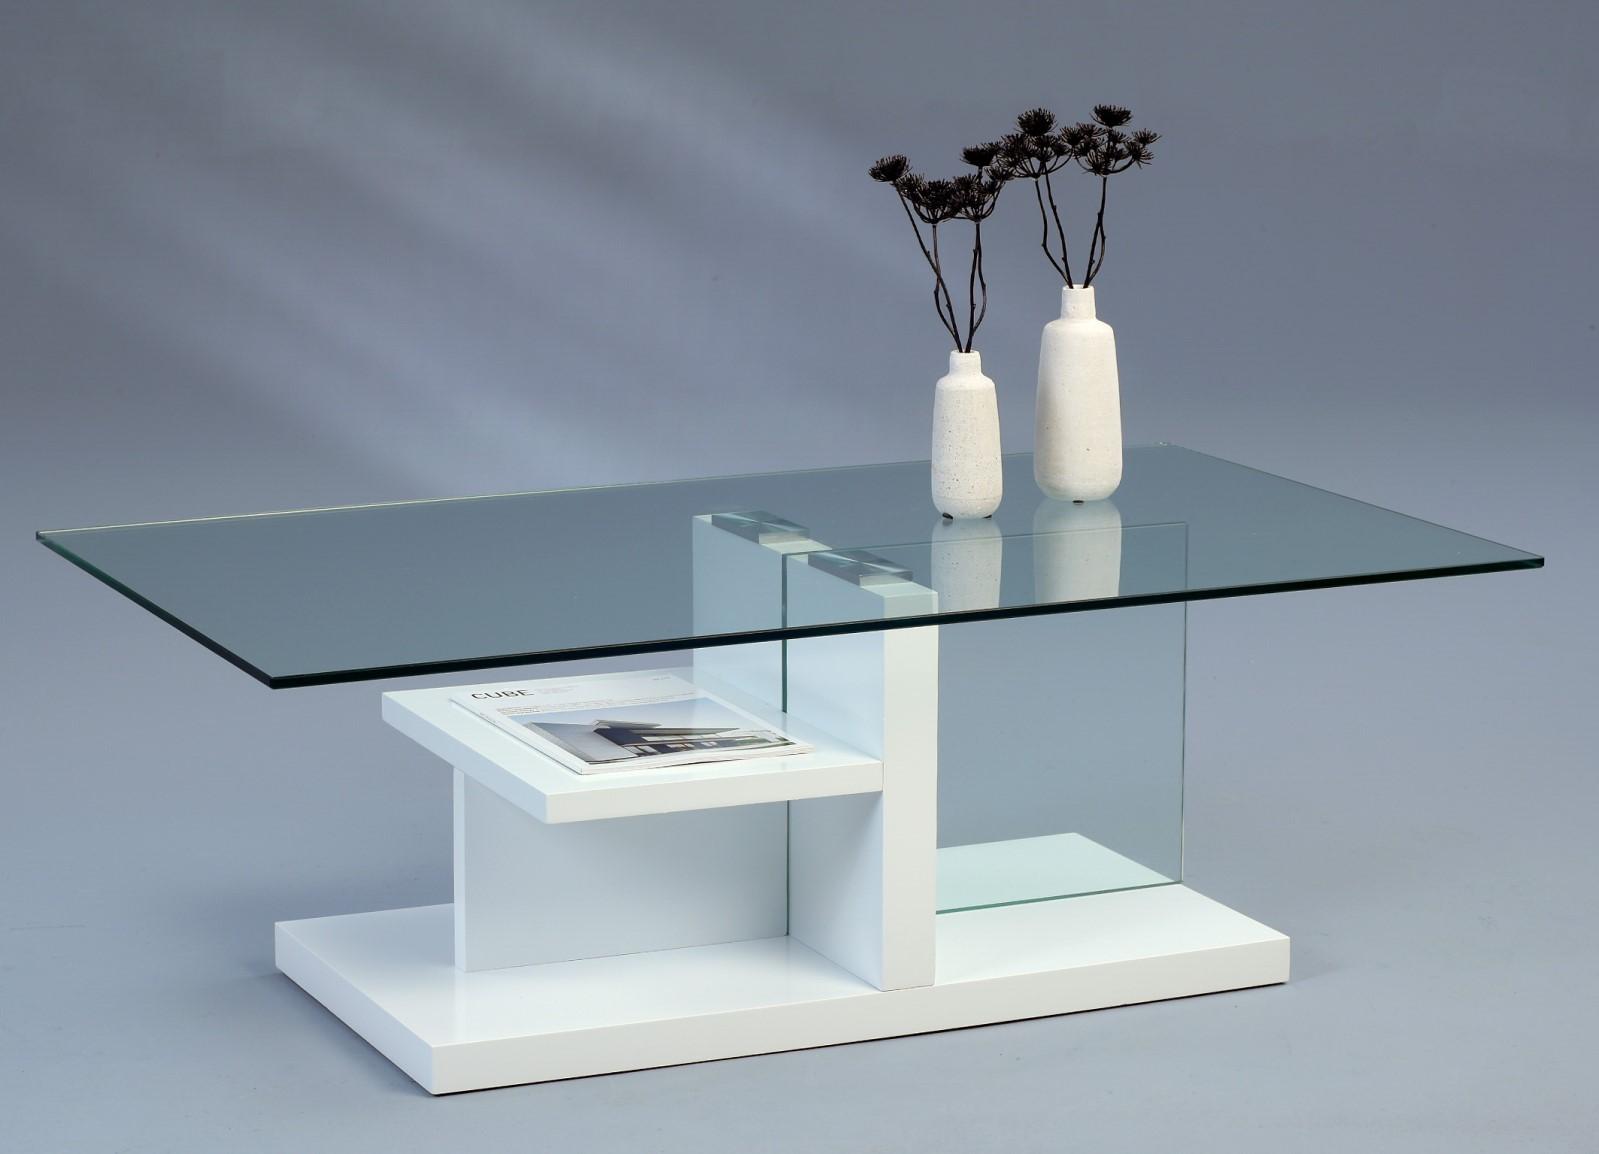 Couchtisch Beistelltisch - Diana - 115x65 cm  Weiss matt